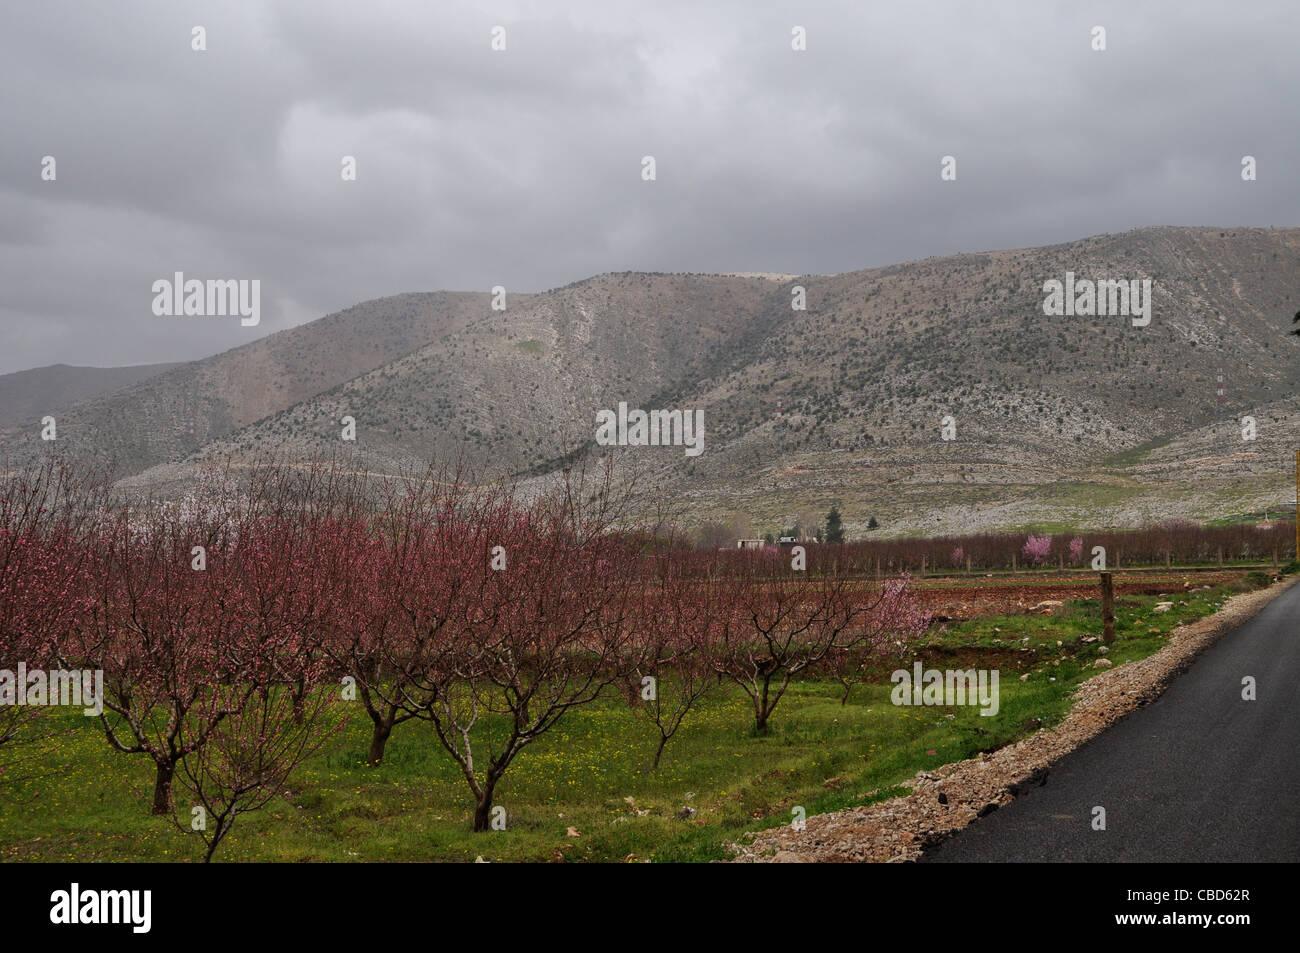 Anjar, Anti-Lebanon mountain range, Syrian border with Lebanon, spring among cherry trees instead of former opium - Stock Image